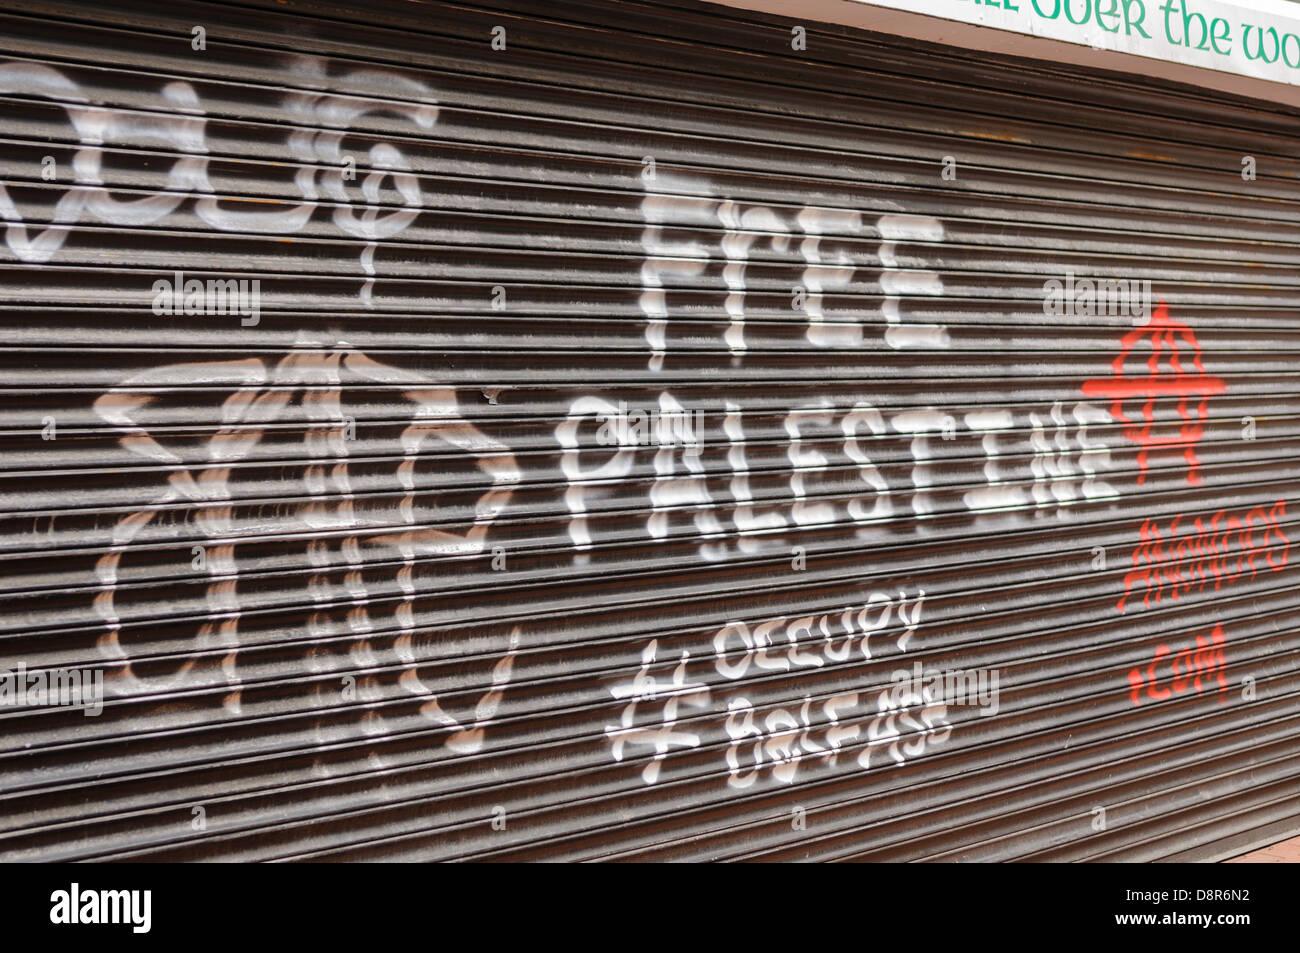 Grafitti on a shop shutter 'Free Palestine #occupy belfast' - Stock Image